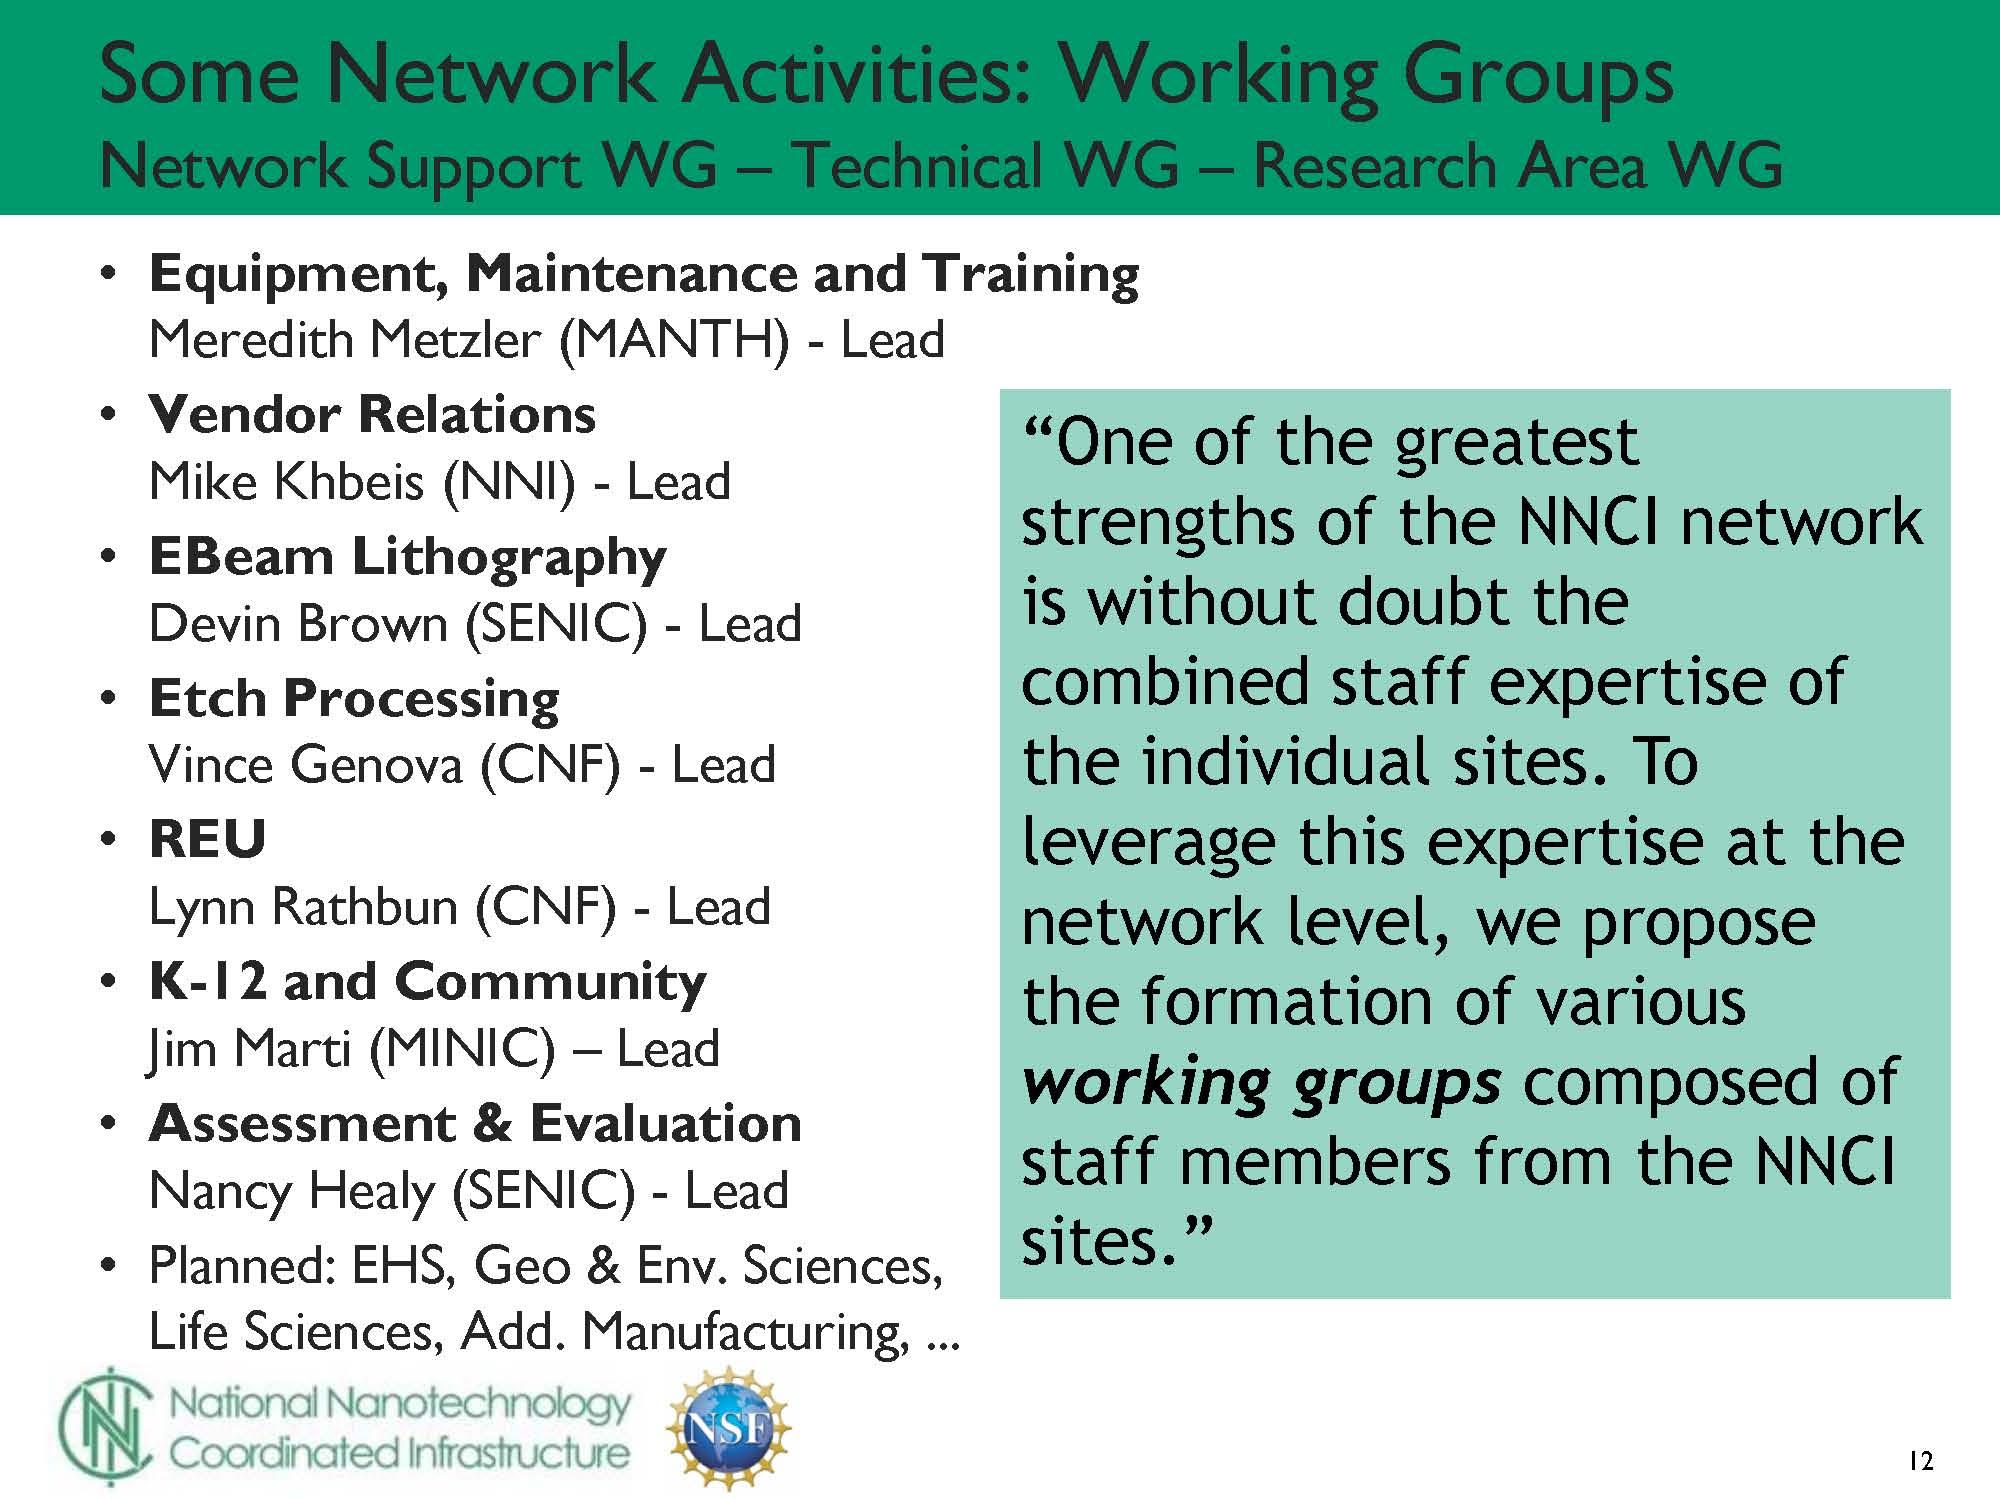 NSF 2017 NanoscienceGrantees Conf - NNCI presentation by Mark Allen_Page_12.jpg